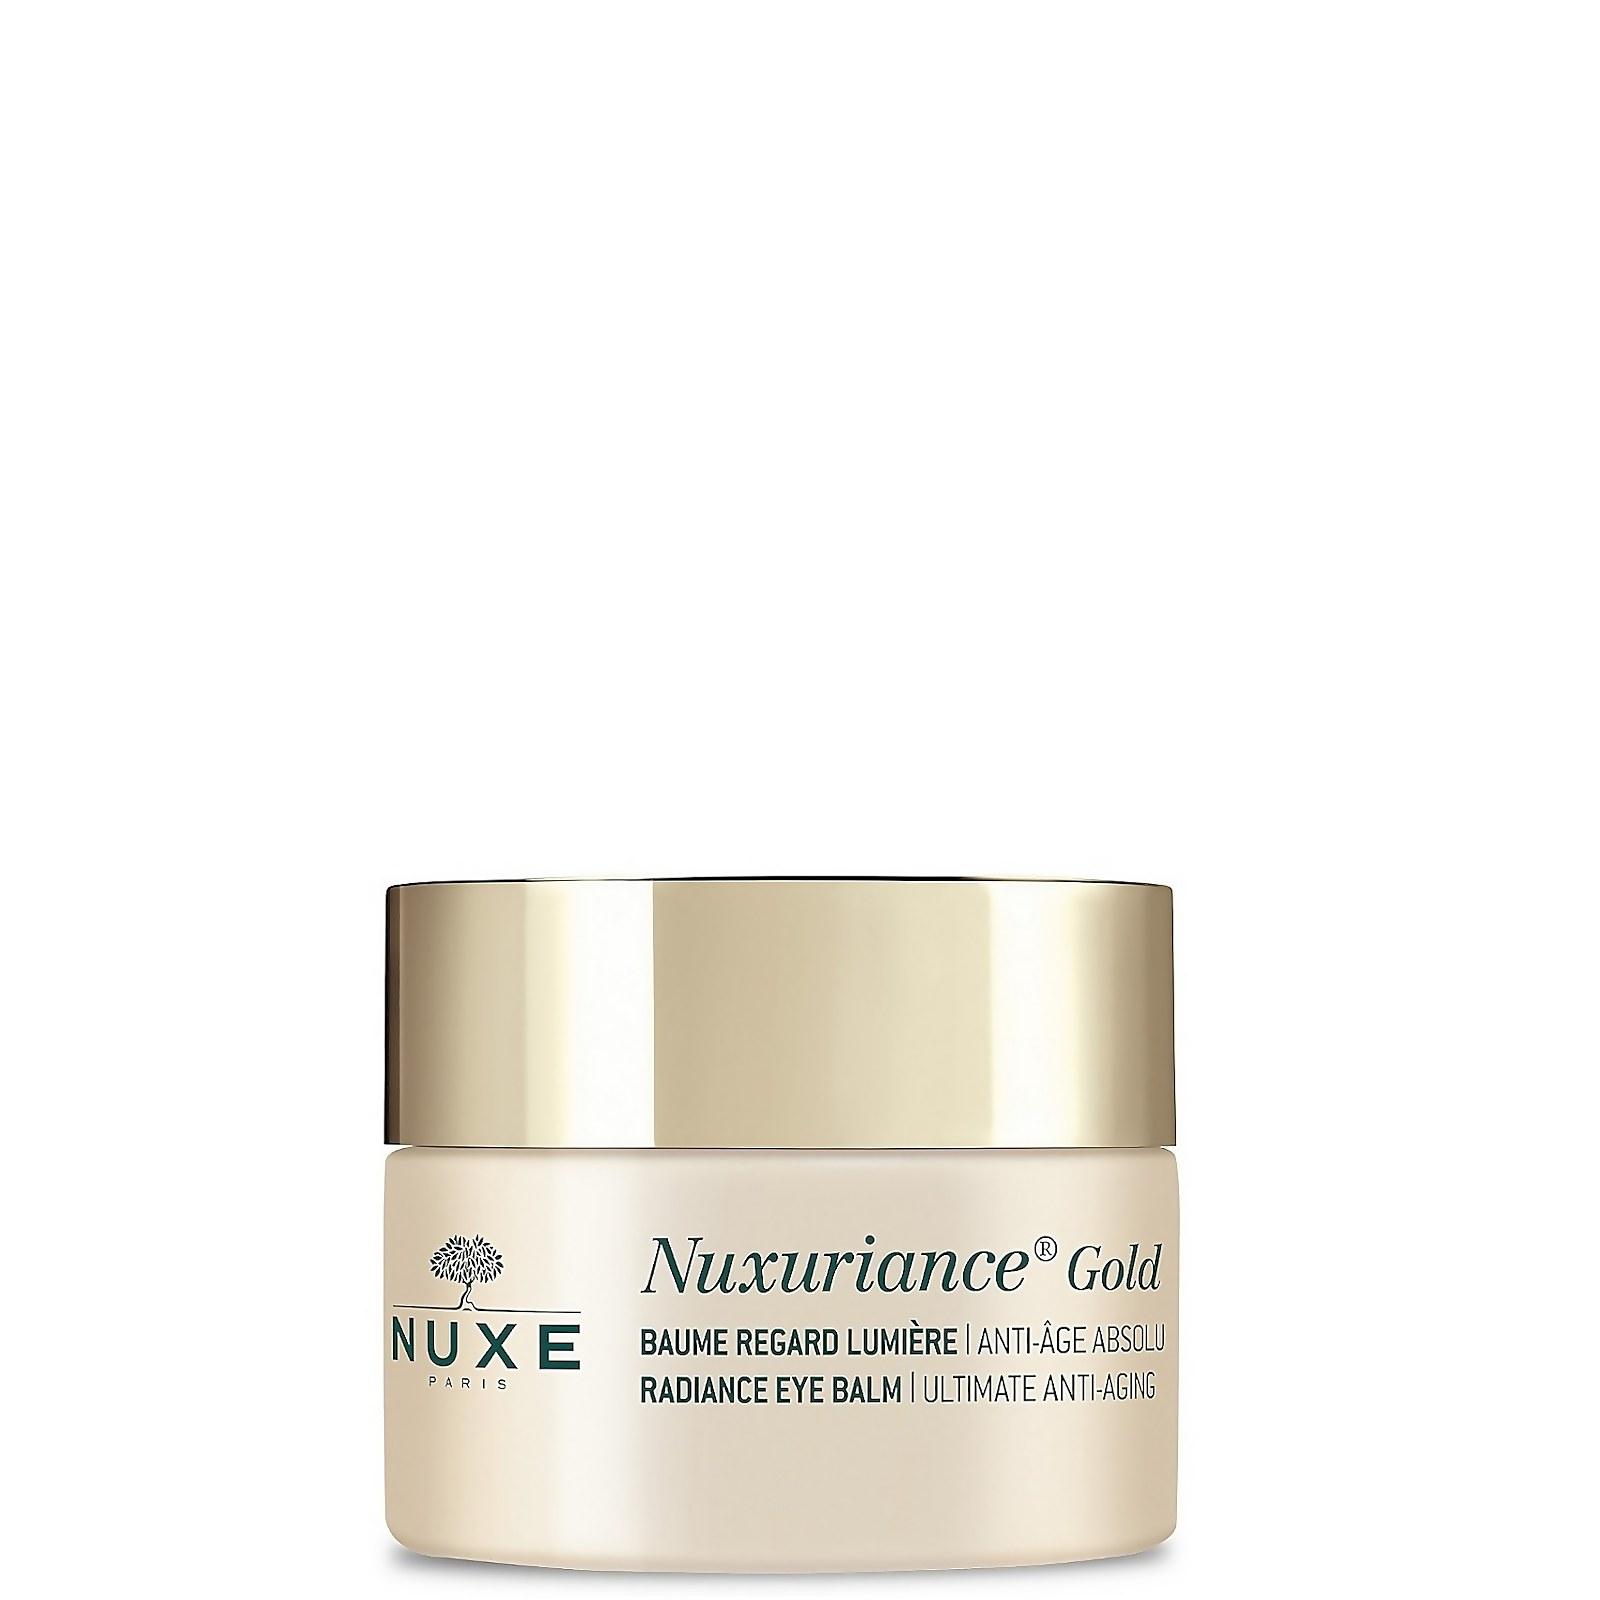 NUXE Nuxuriance Gold Nutri-Replenishing Eye Cream